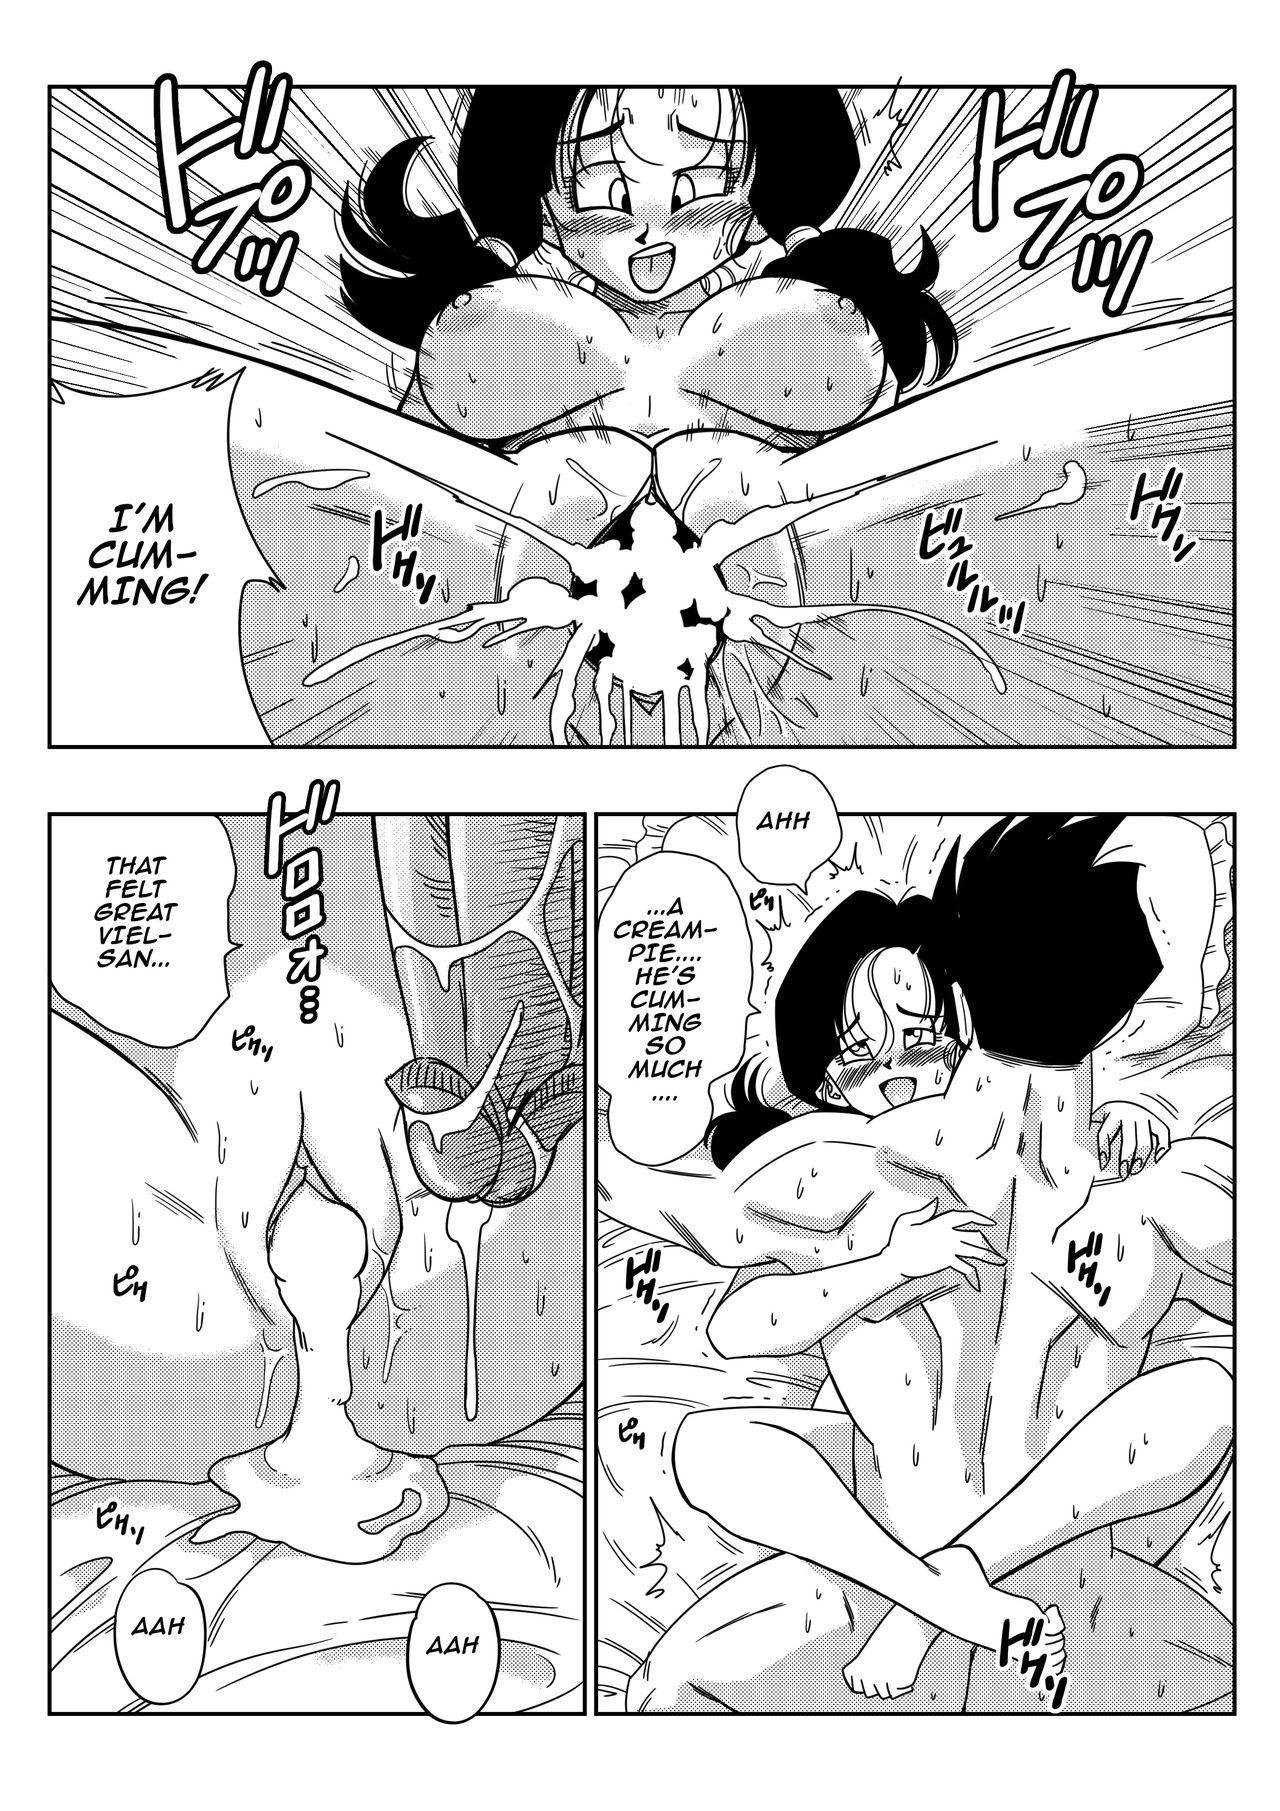 [Yamamoto] LOVE TRIANGLE Z PART 2 - Takusan Ecchi Shichaou! | LOVE TRIANGLE Z PART 2 - Let's Have Lots of Sex! (Dragon Ball Z) [English] [Decensored] 14